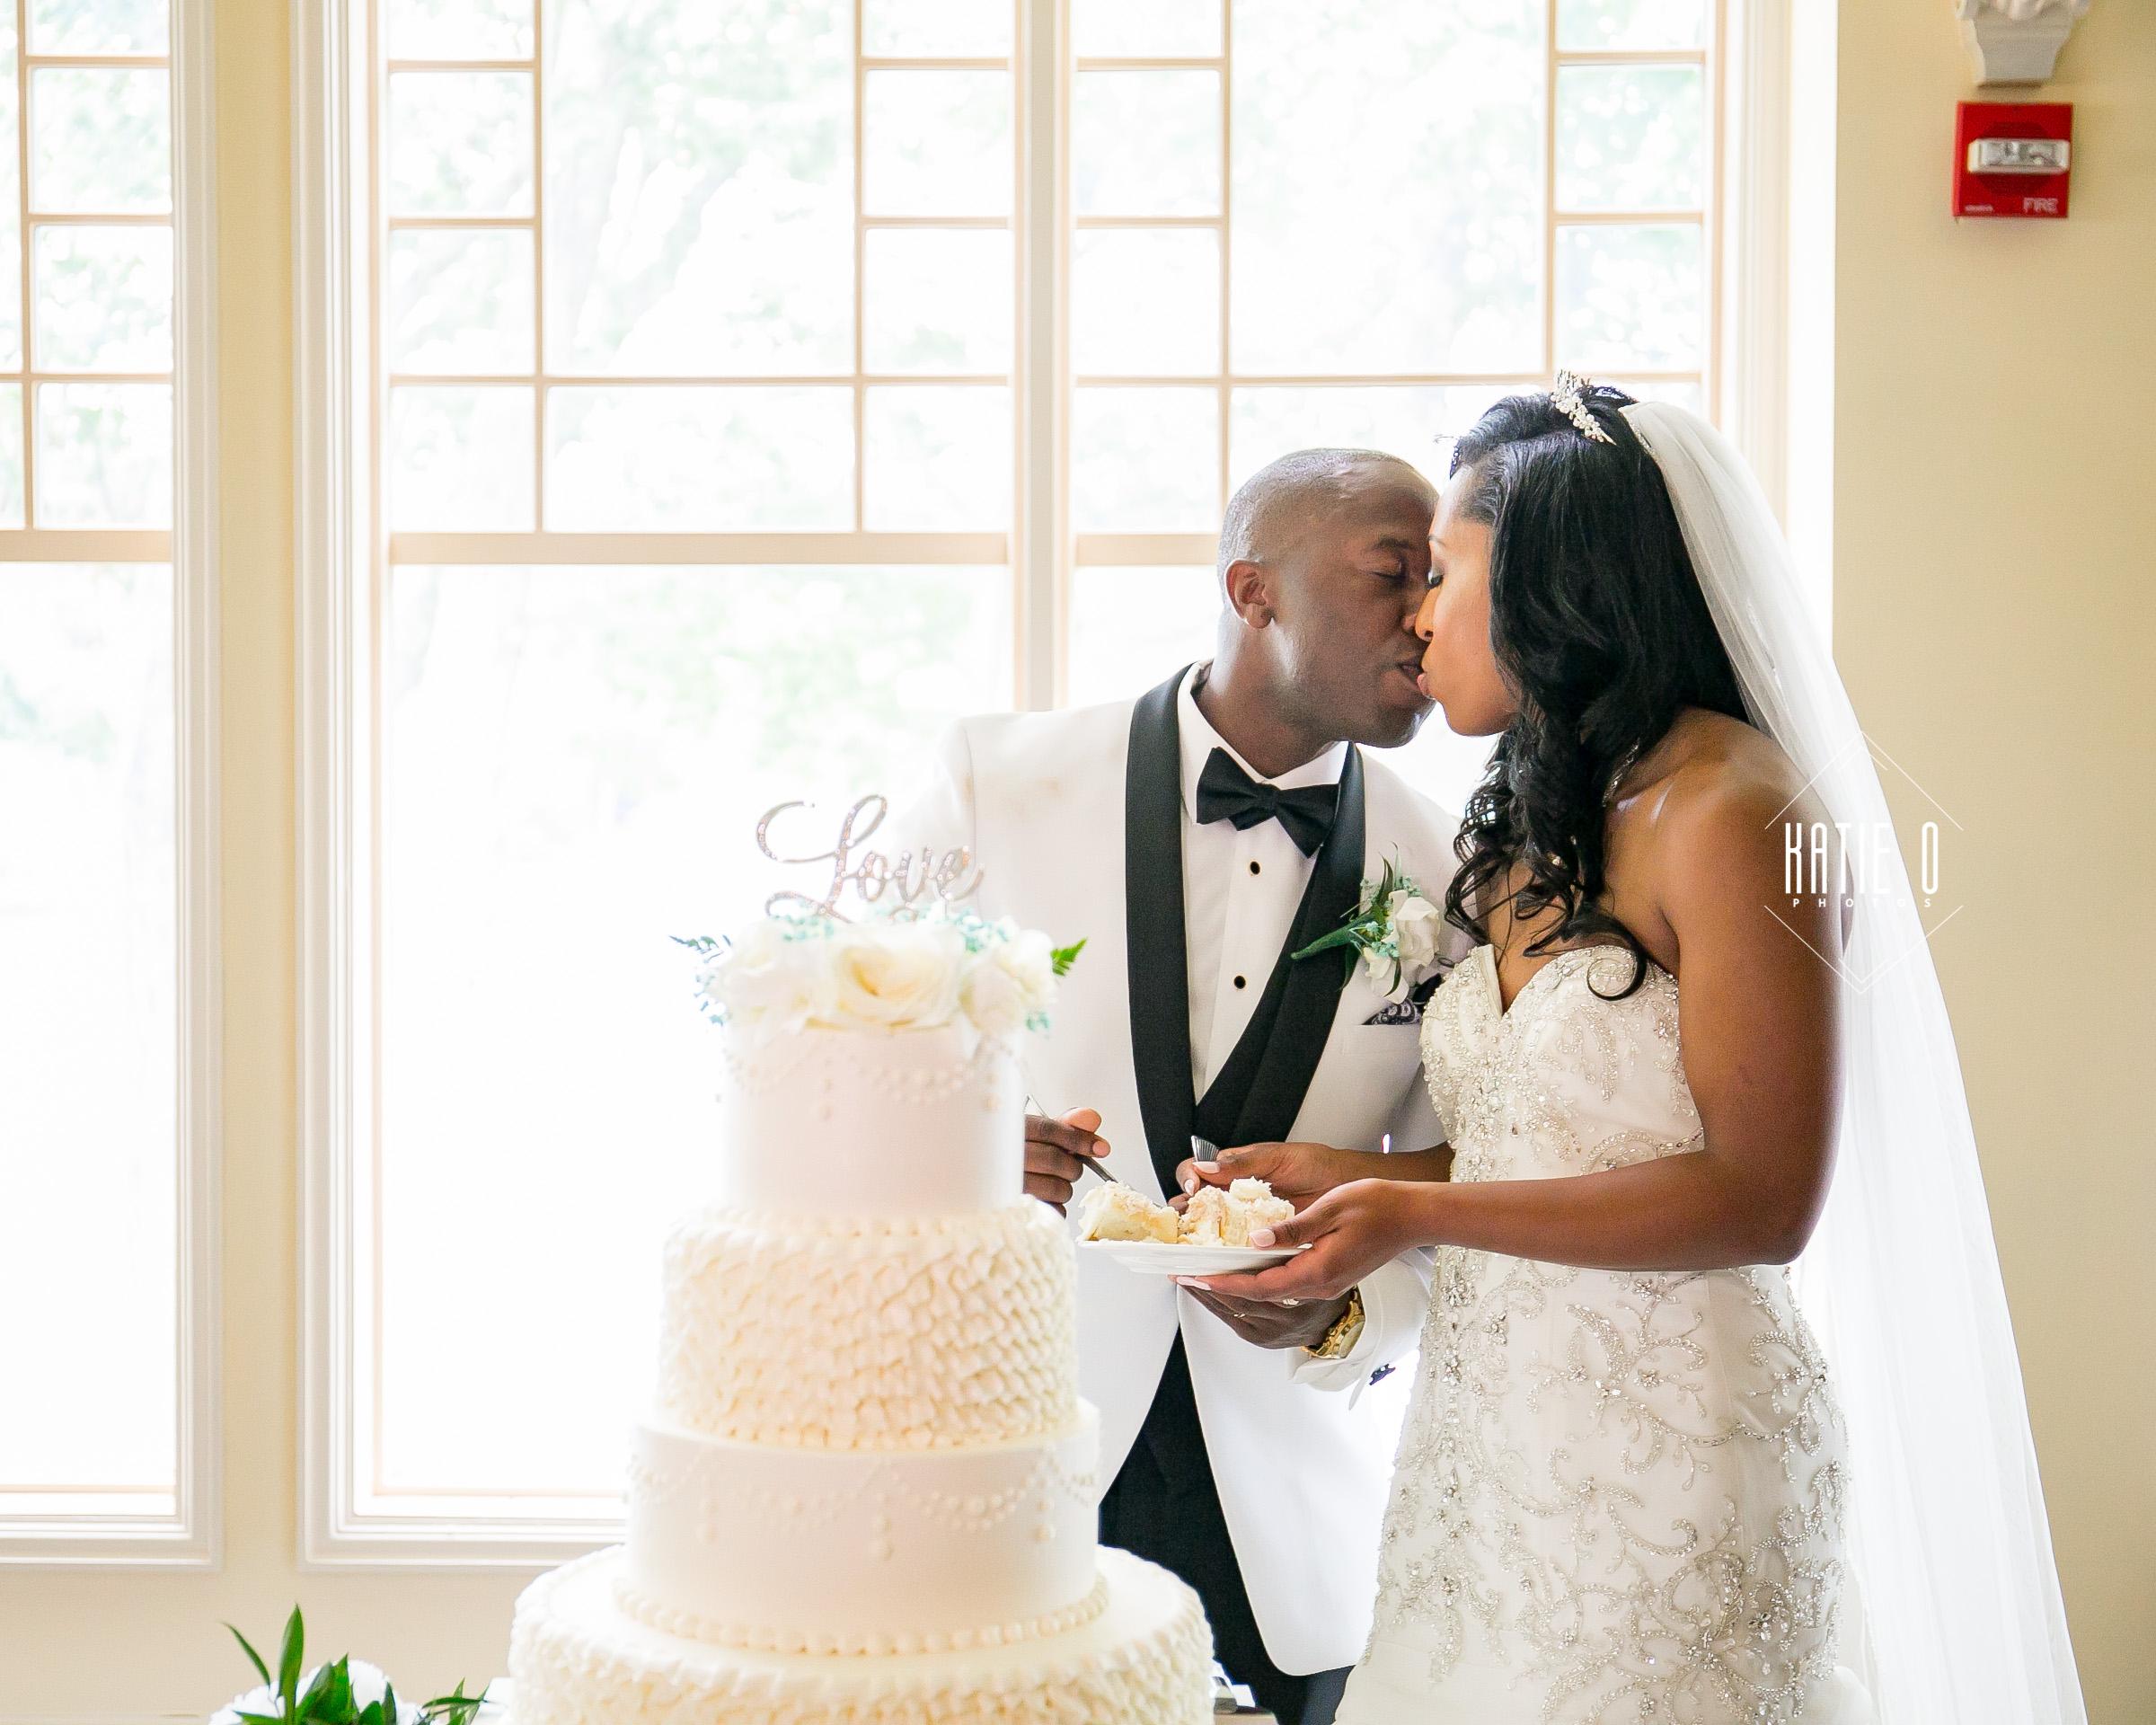 CT-WEDDING-PHOTOGRAPHER-BLOG-50.jpg